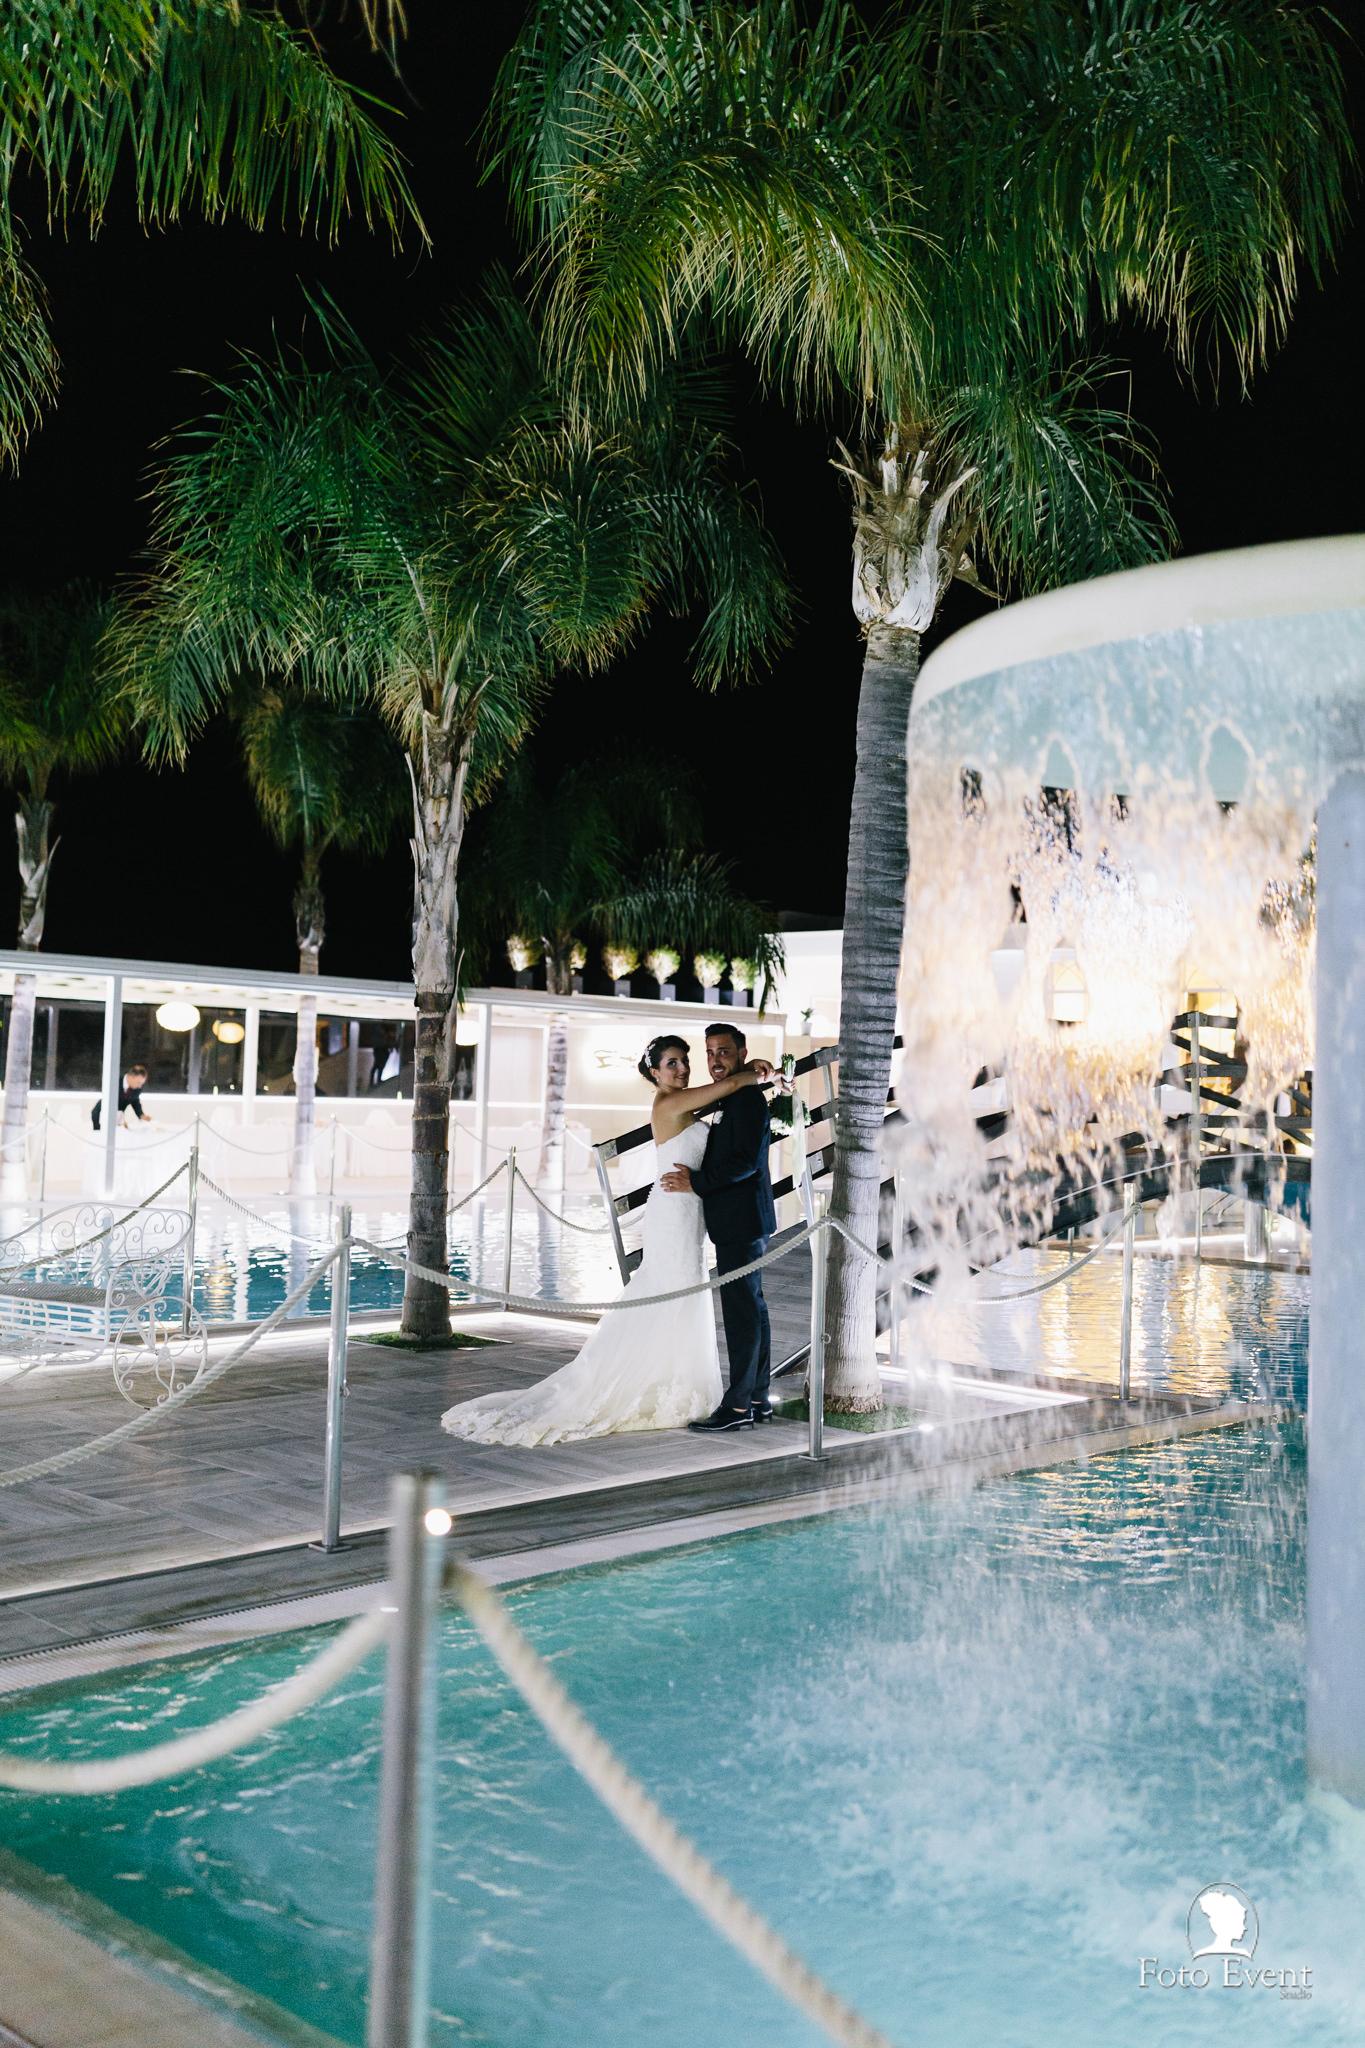 049-2019-08-31-Matrimonio-Serena-e-Saverio-Tarantino-zoom-541